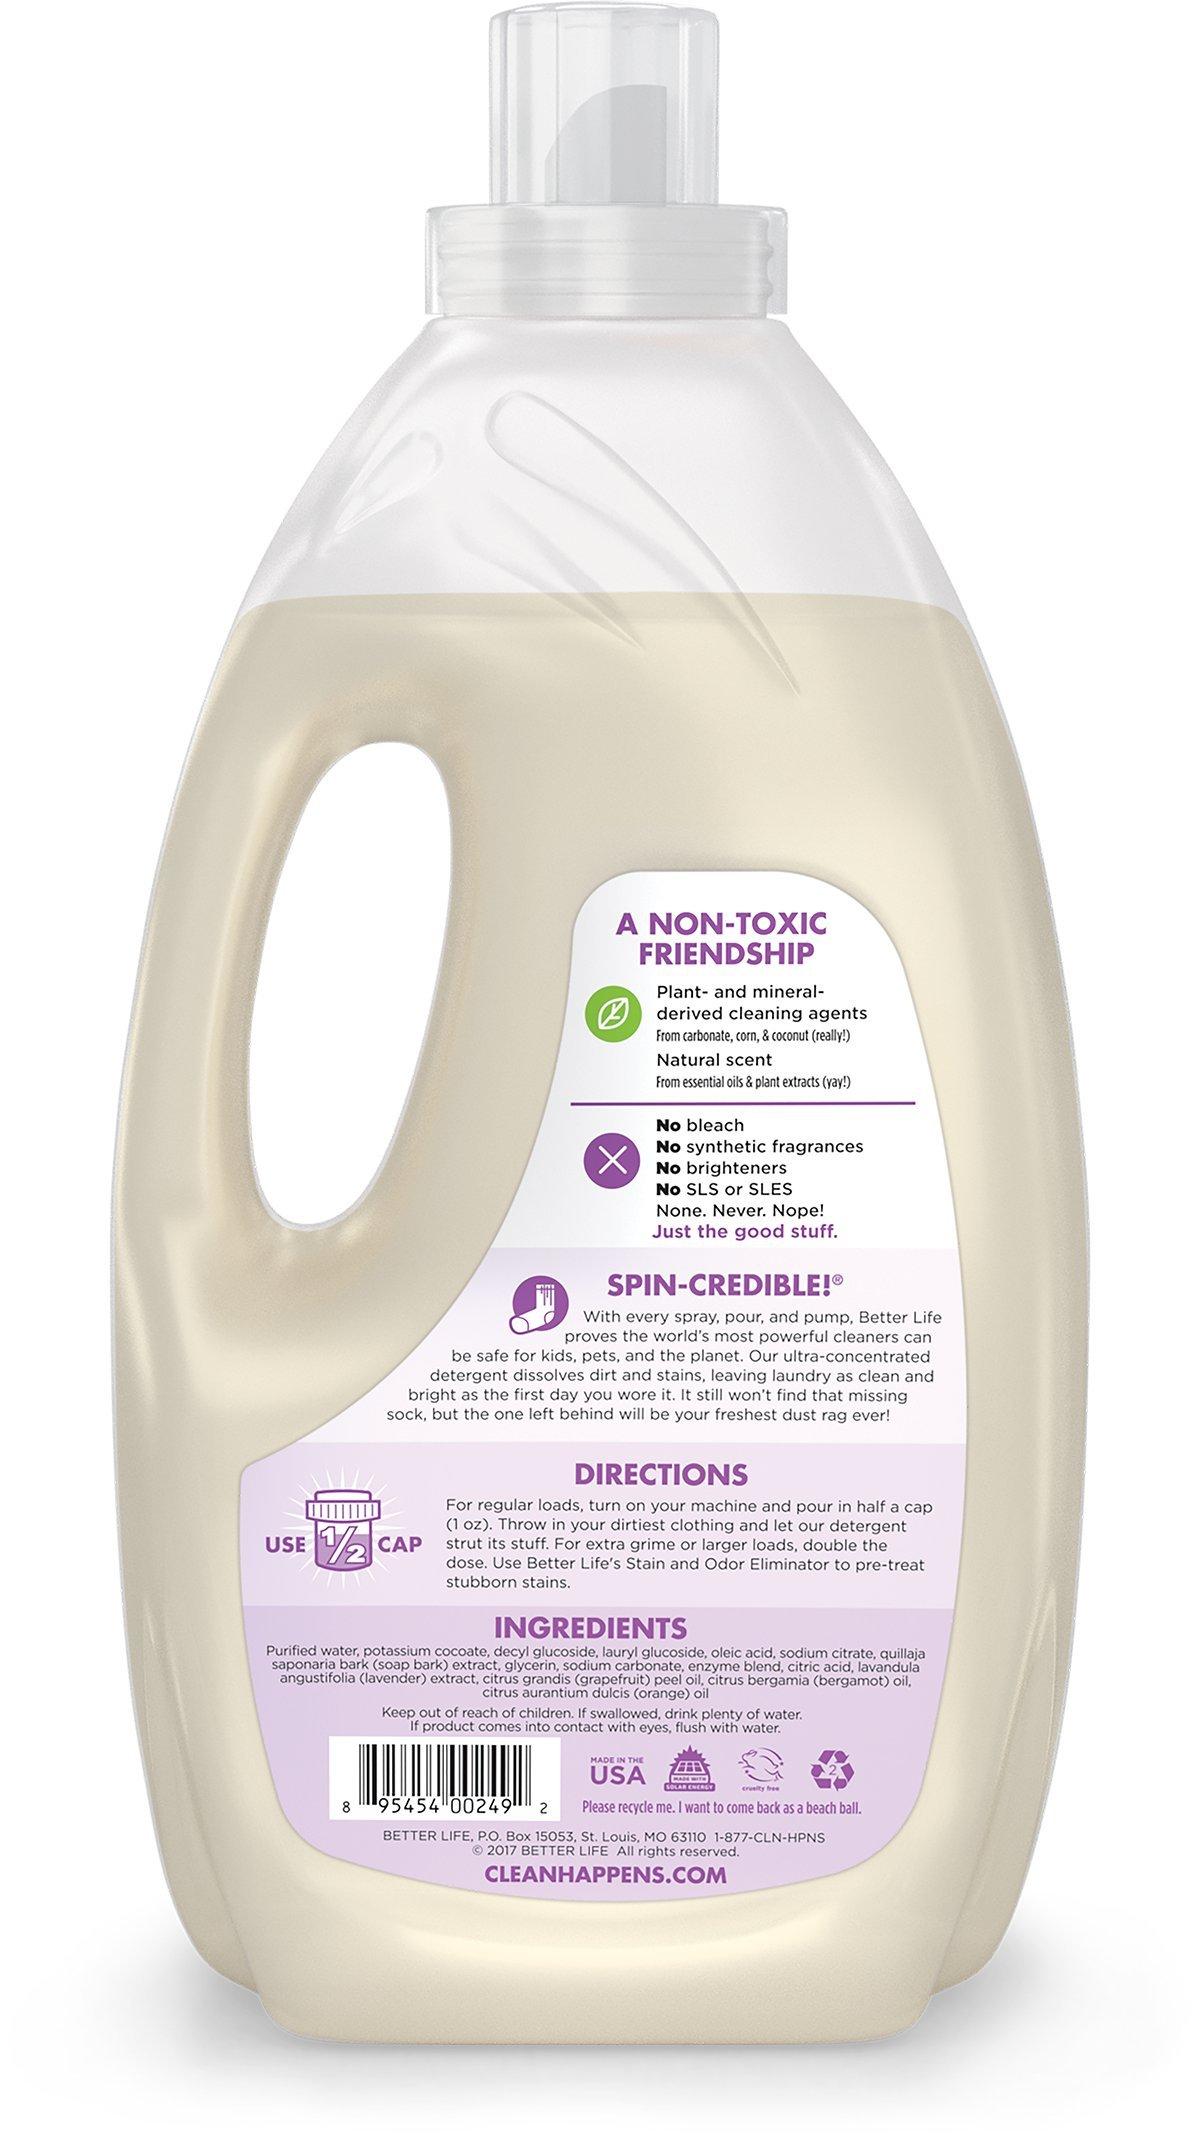 Better Life Natural Concentrated Laundry Detergent, Lavender Grapefruit, 64 loads